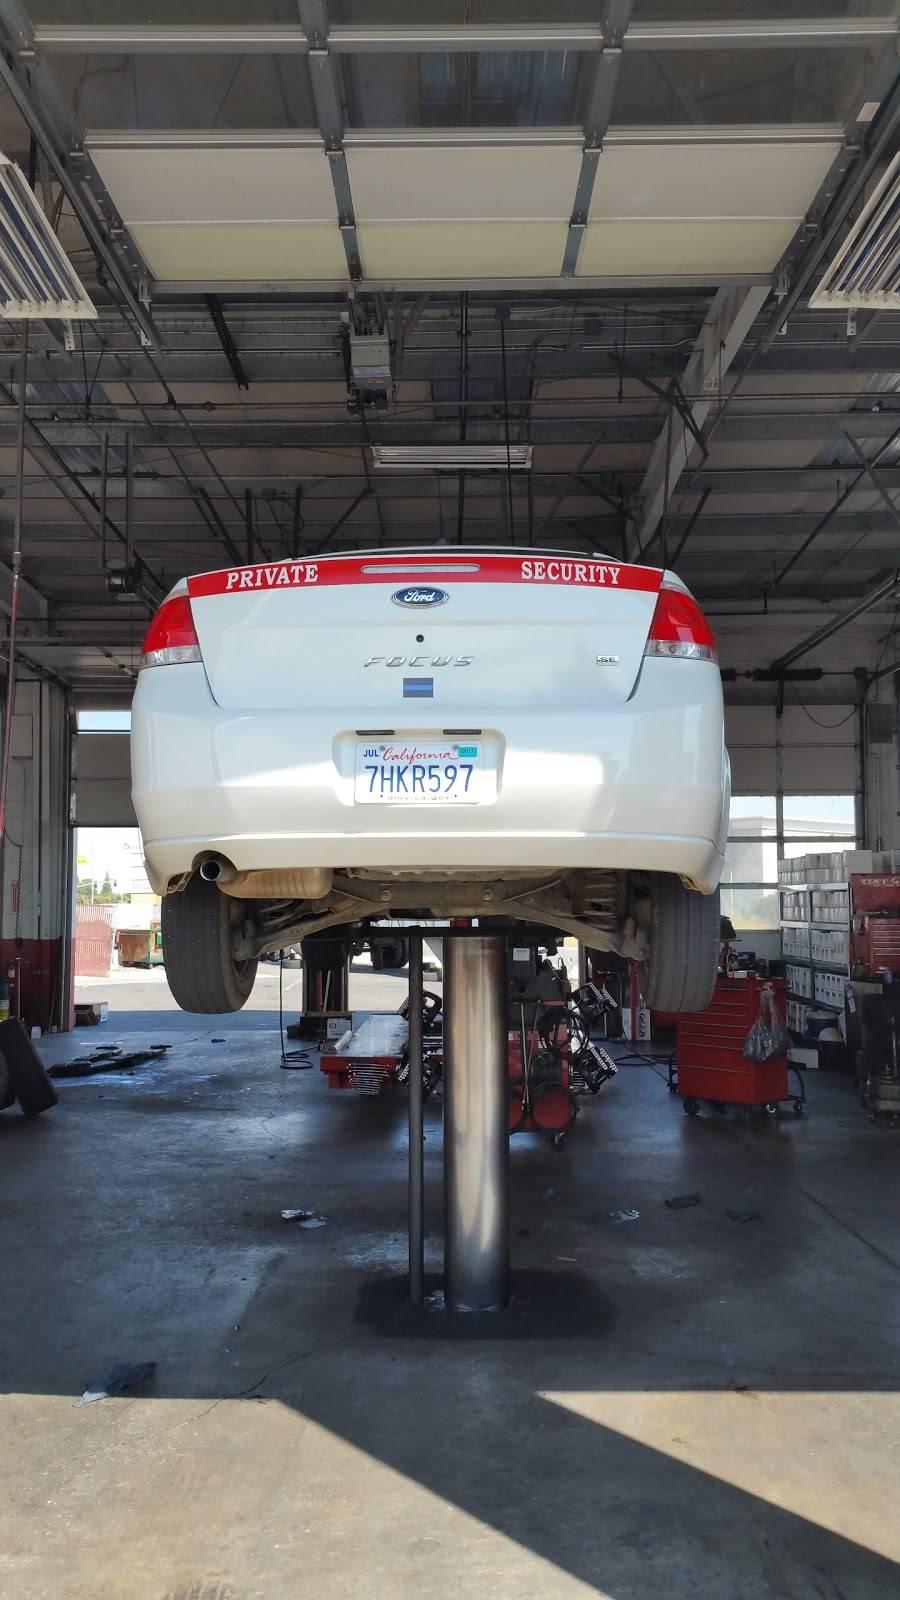 Les Schwab Tire Center - car repair  | Photo 4 of 9 | Address: 3554 E Hammer Ln, Stockton, CA 95212, USA | Phone: (209) 952-8473